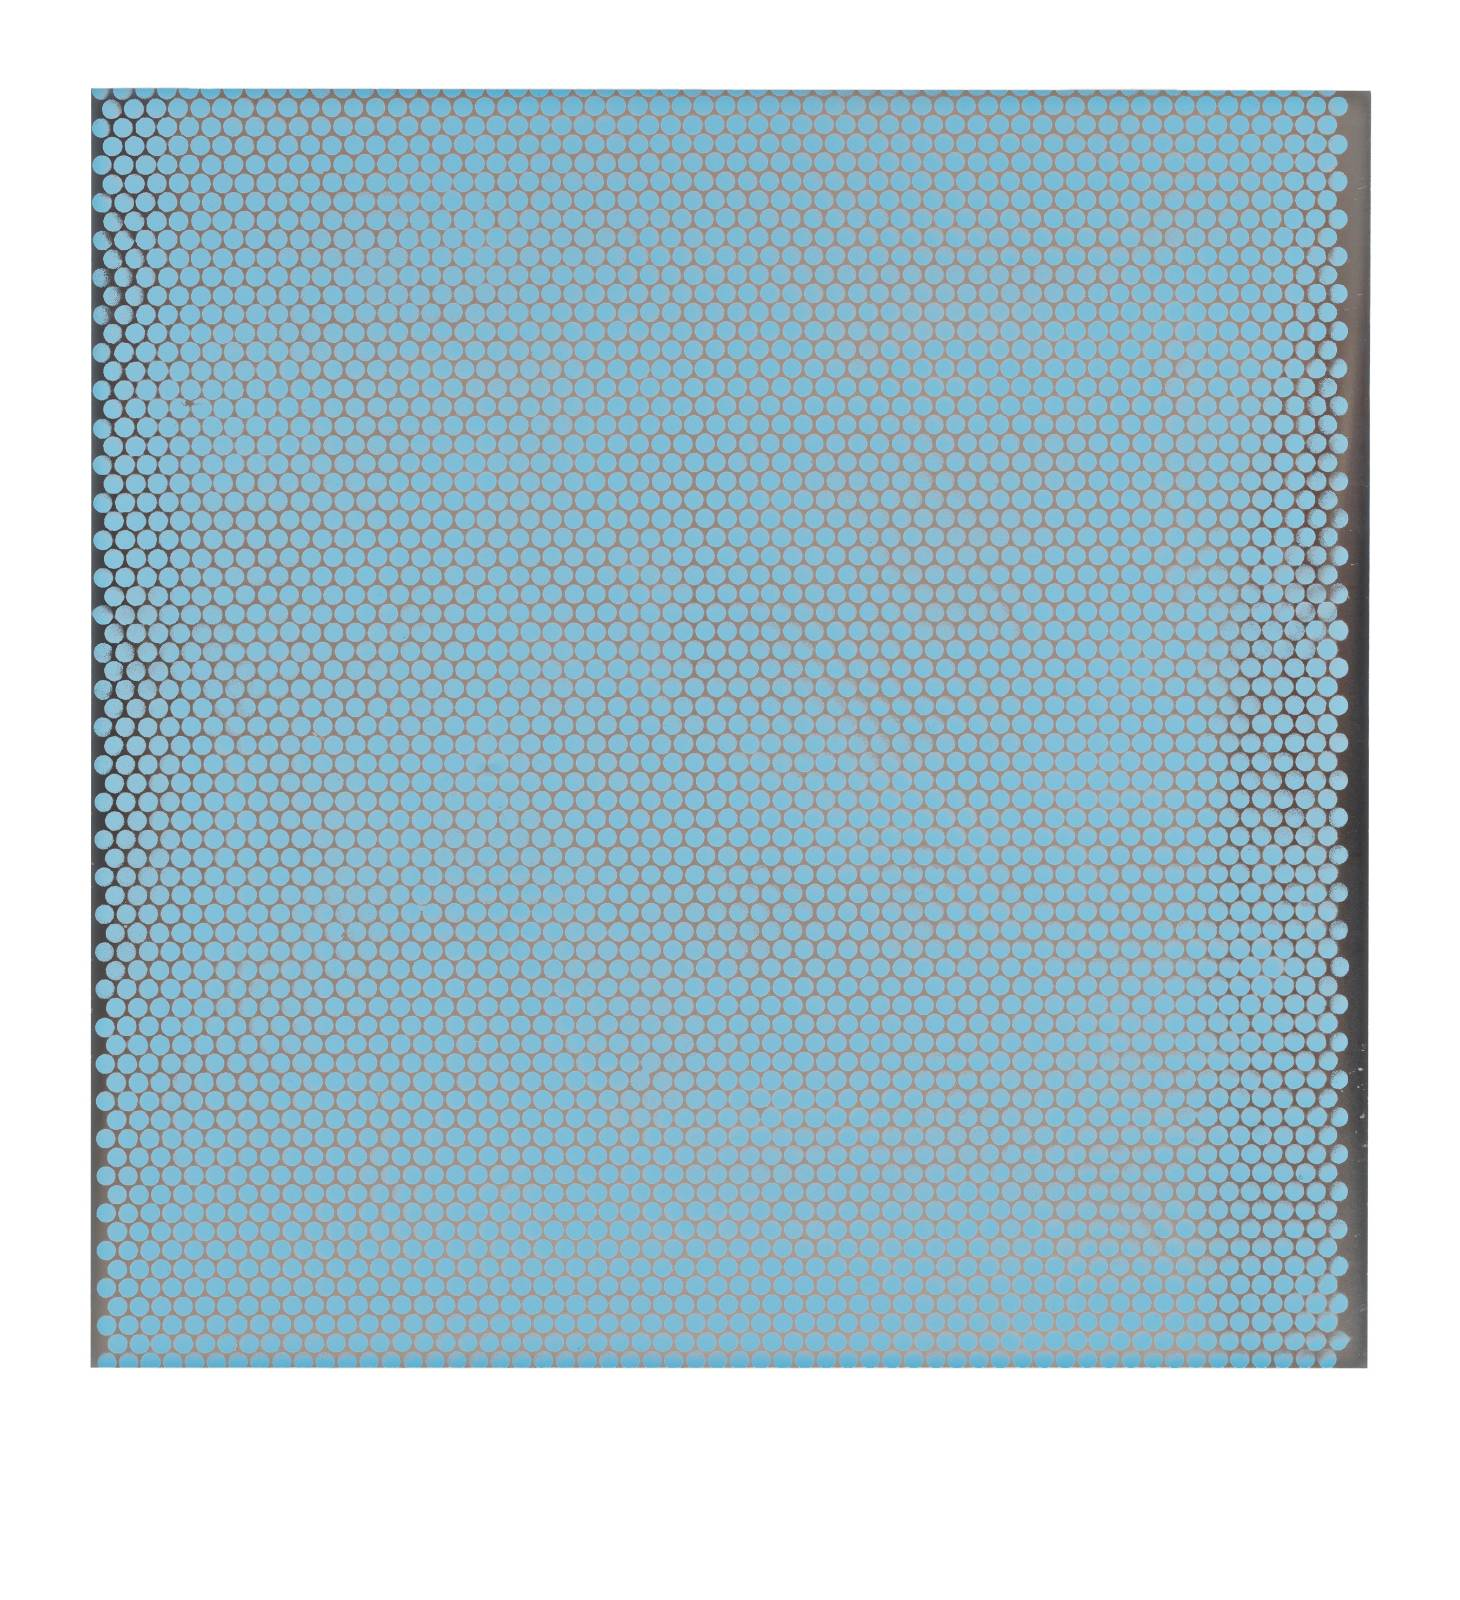 "STAIN : 55°36'55.5""N 13°01'17.3""E, 2016, spraypaint on aluminium, 81,3 x 81,3 cm"